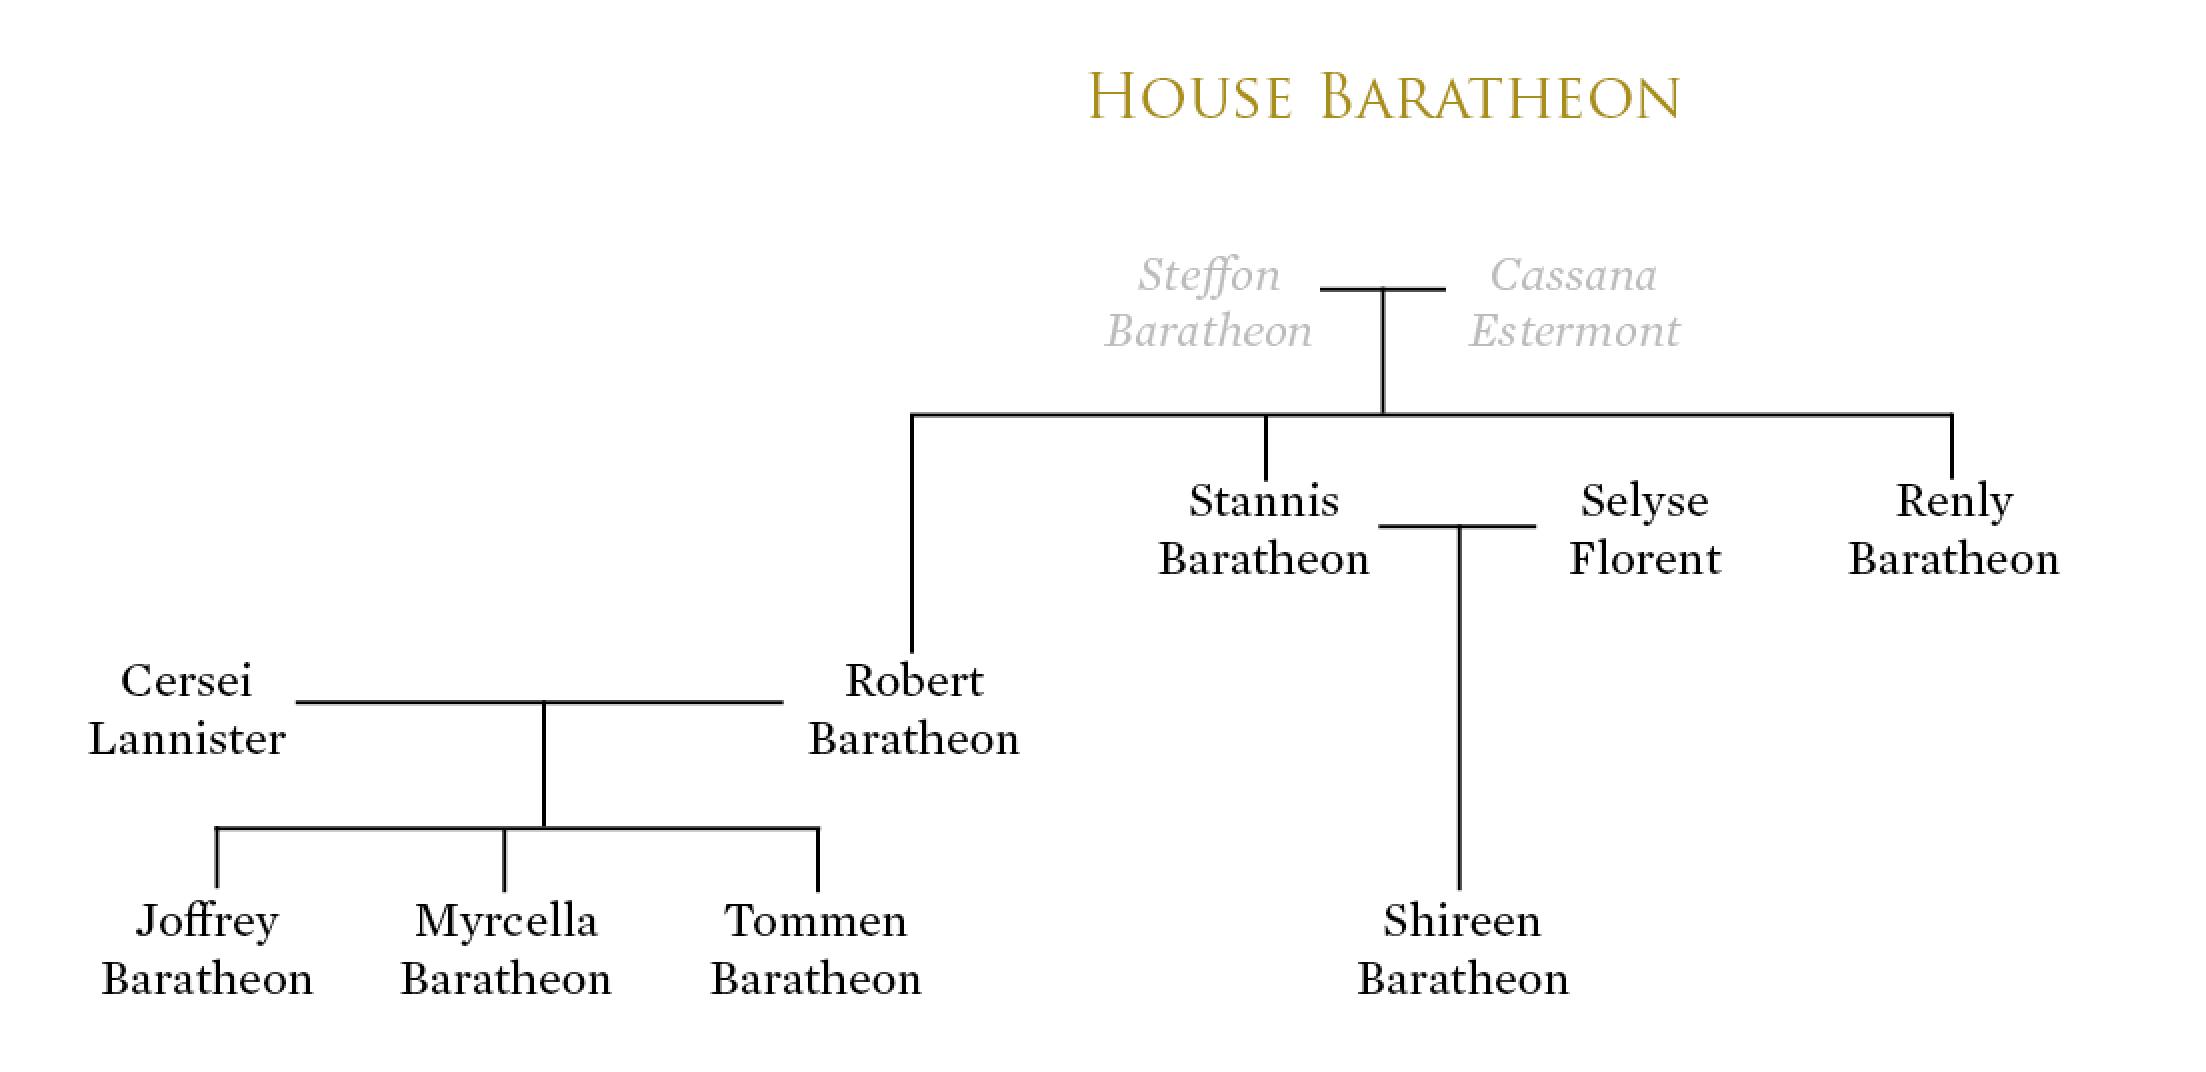 The Baratheon line of the Game of Thrones family tree harbors dangerous secrets.